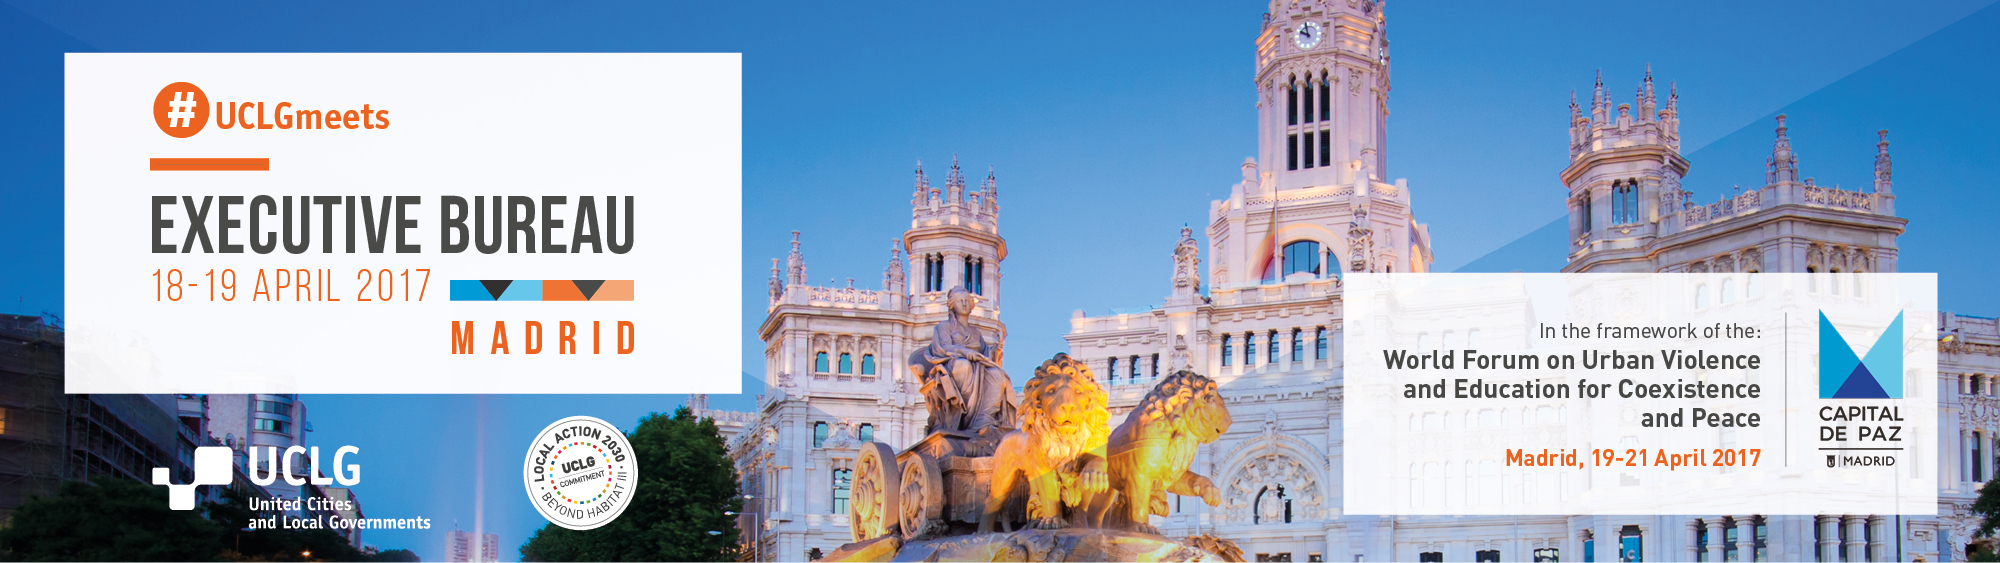 Madrid 2017-Bureau Ejecutivo